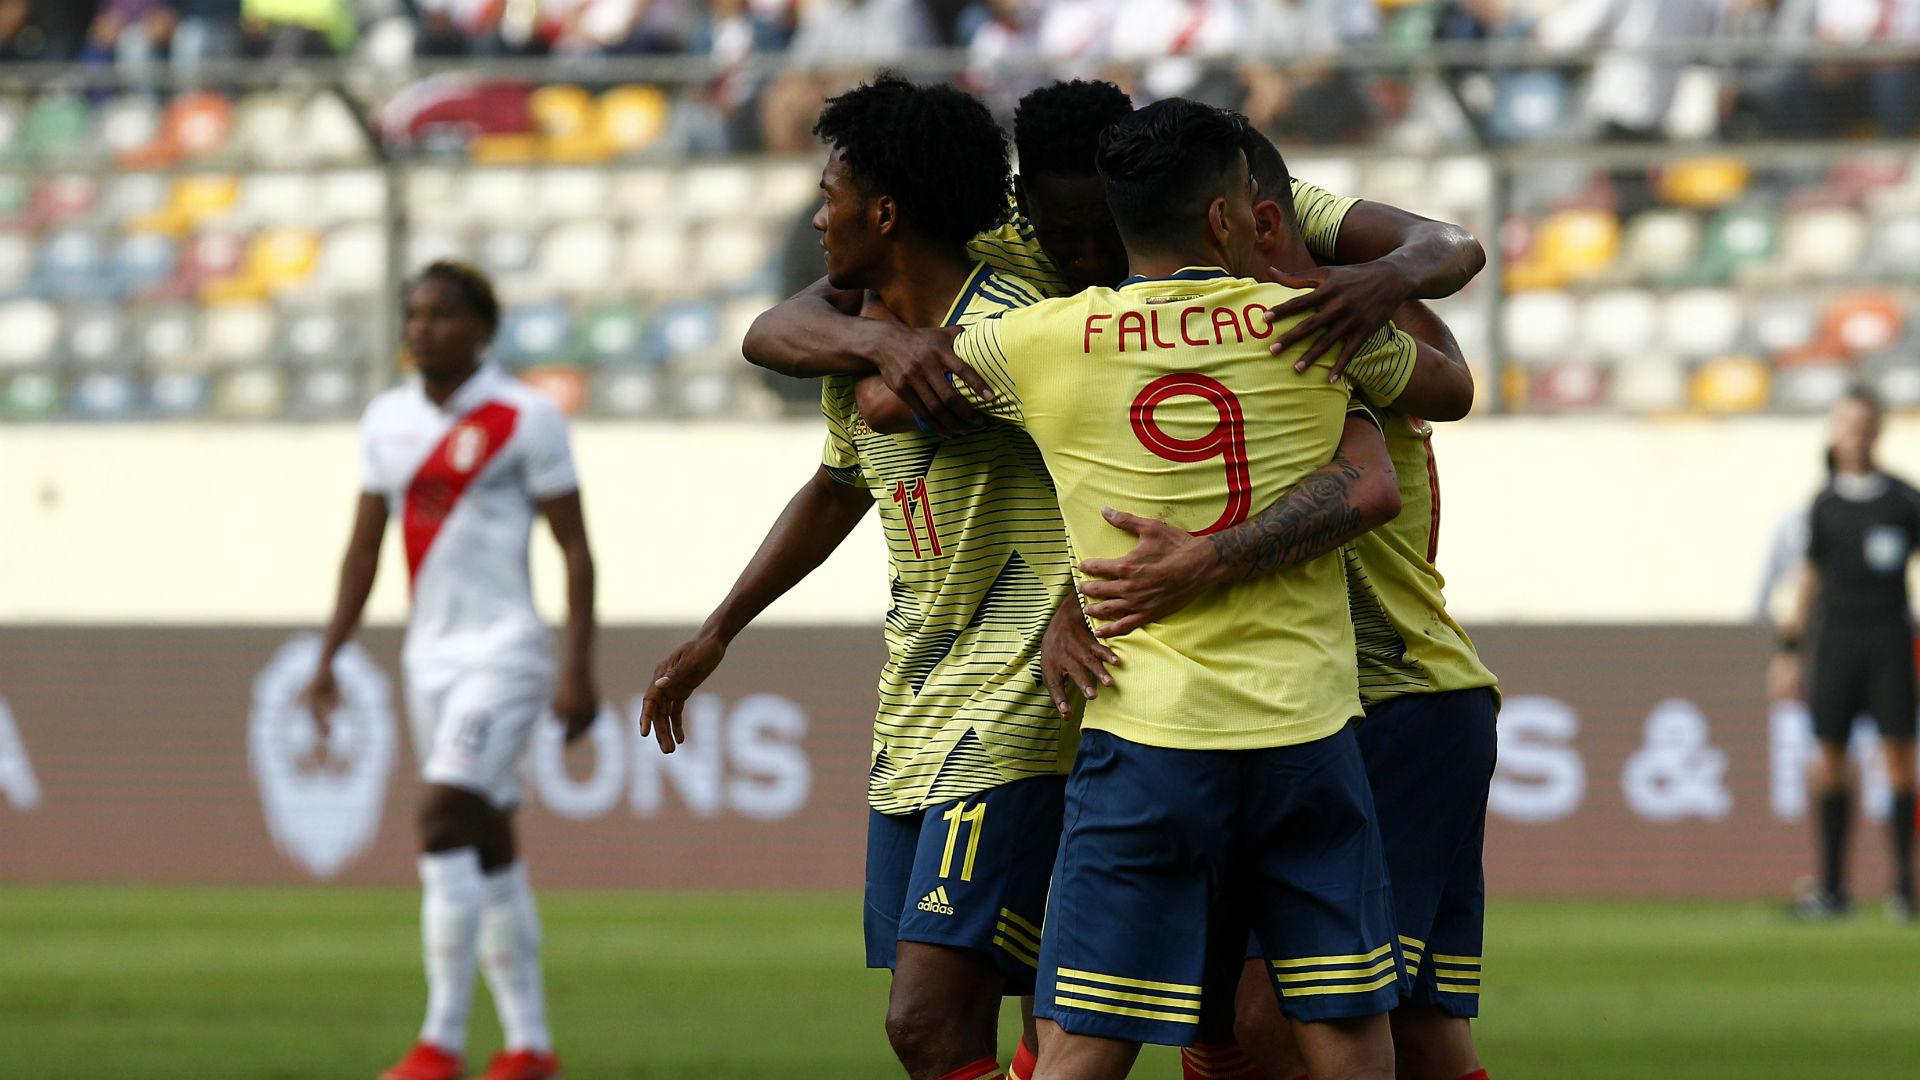 Colombia gol - Perú Amistoso 2019